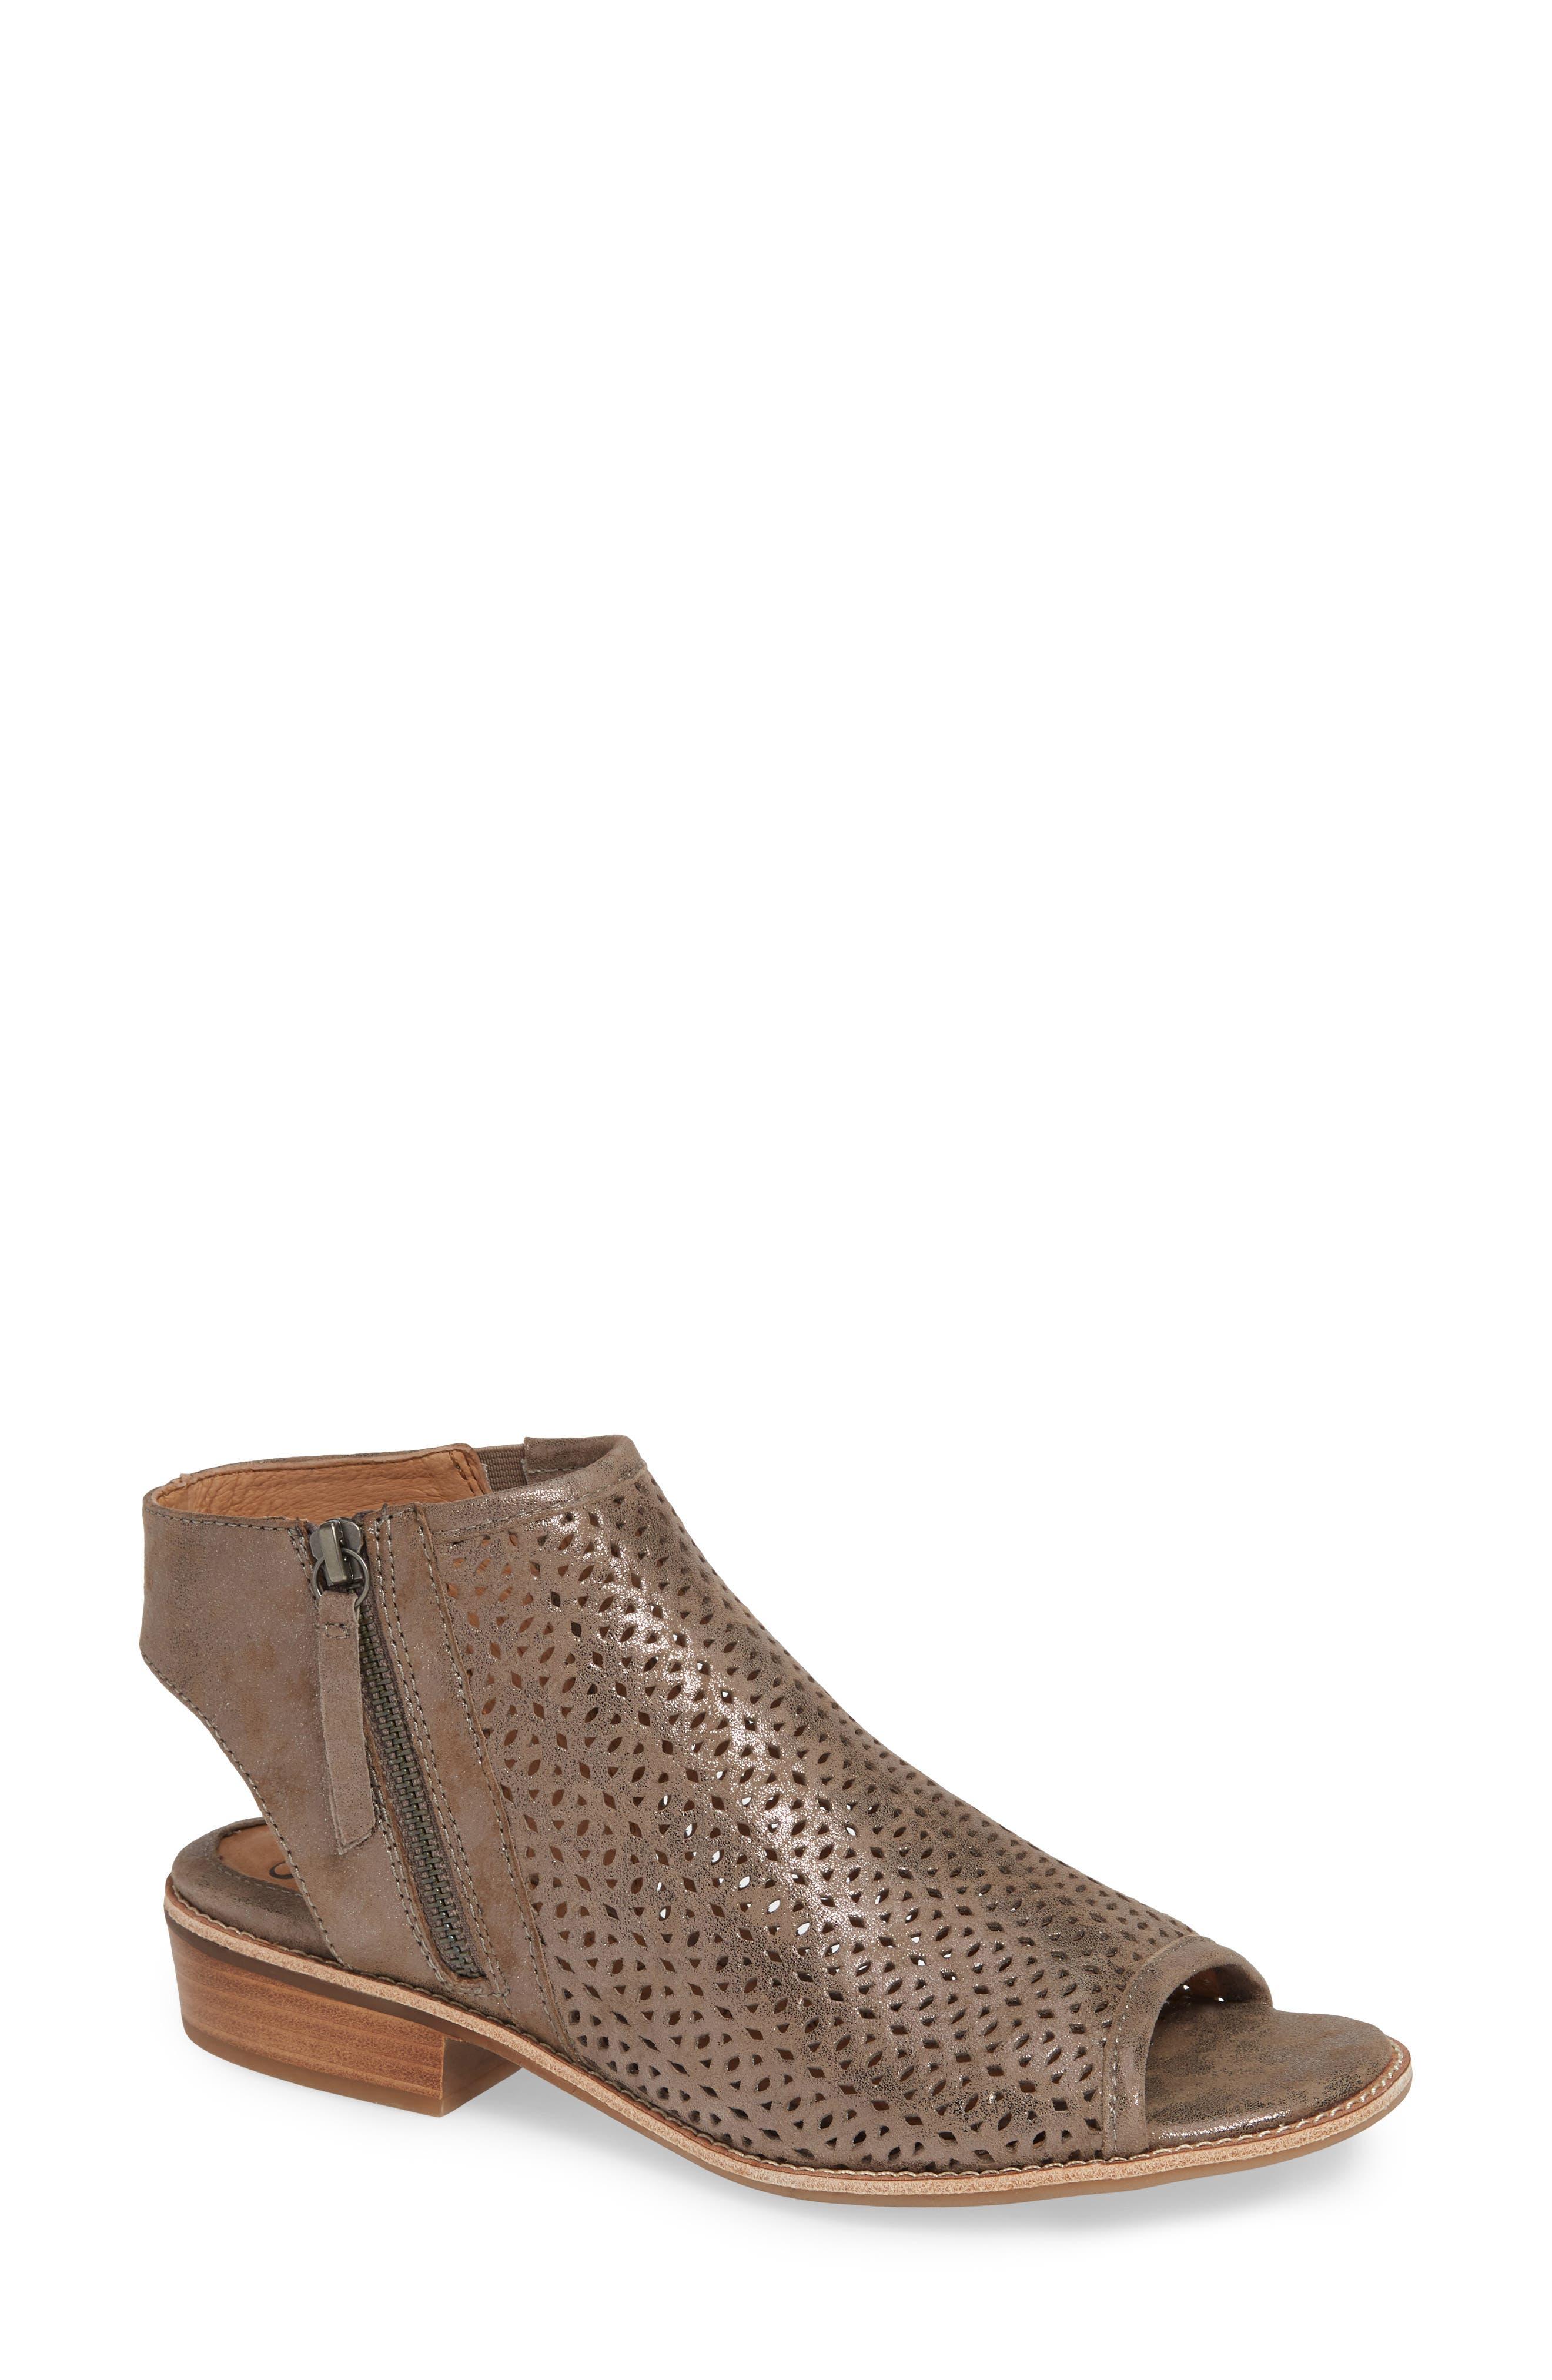 Natesa Perforated Sandal, Main, color, SMOKE SUEDE